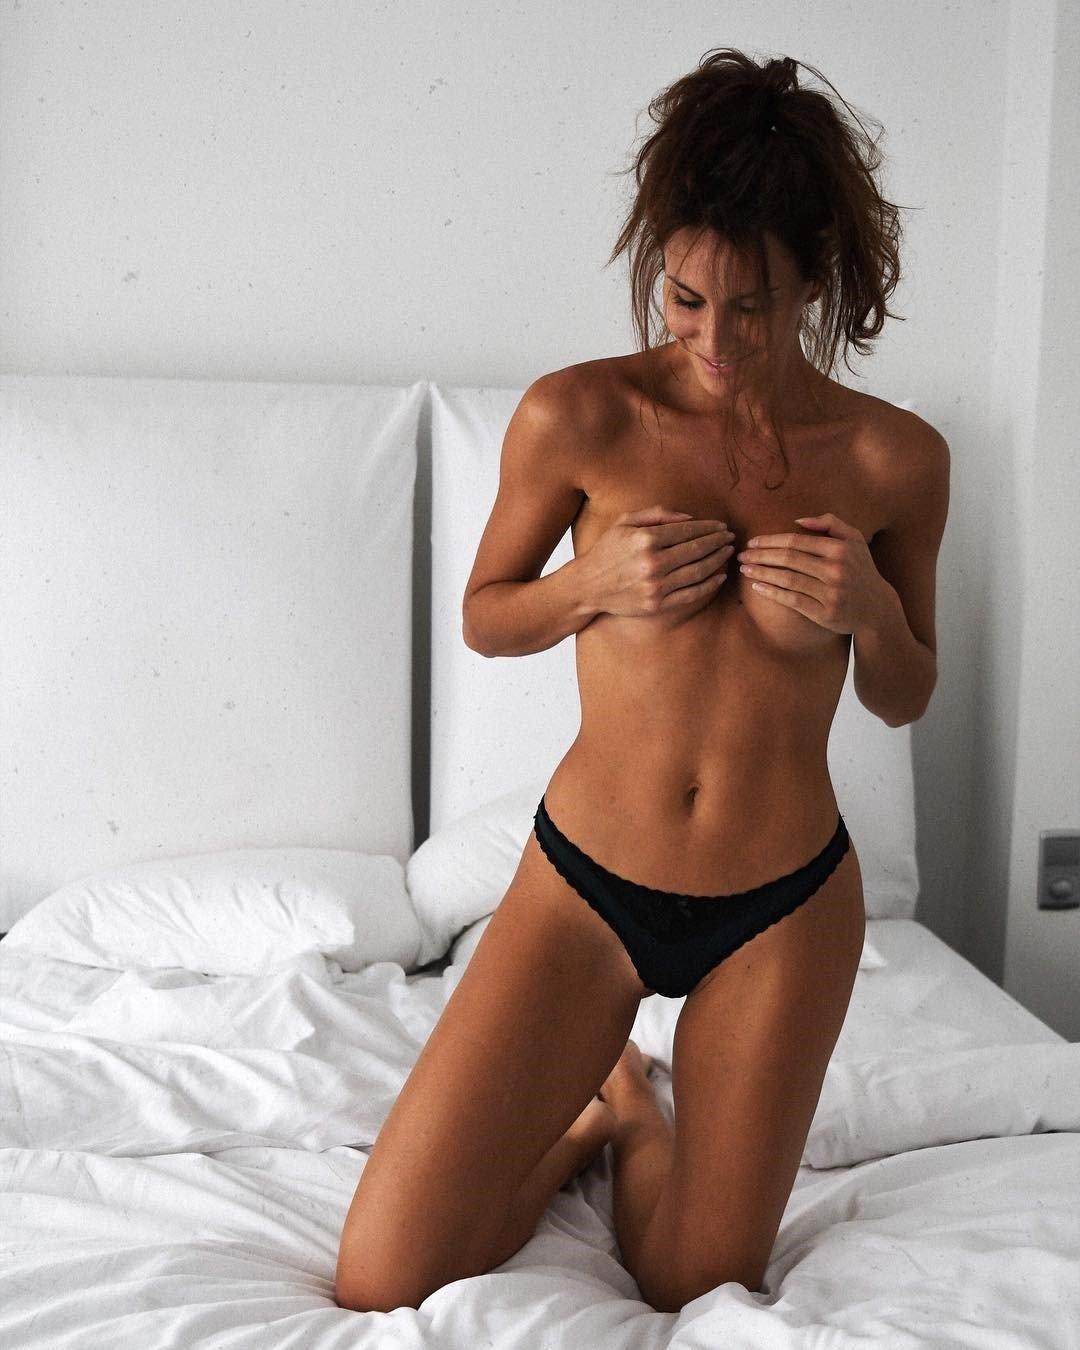 Andja lorein nude